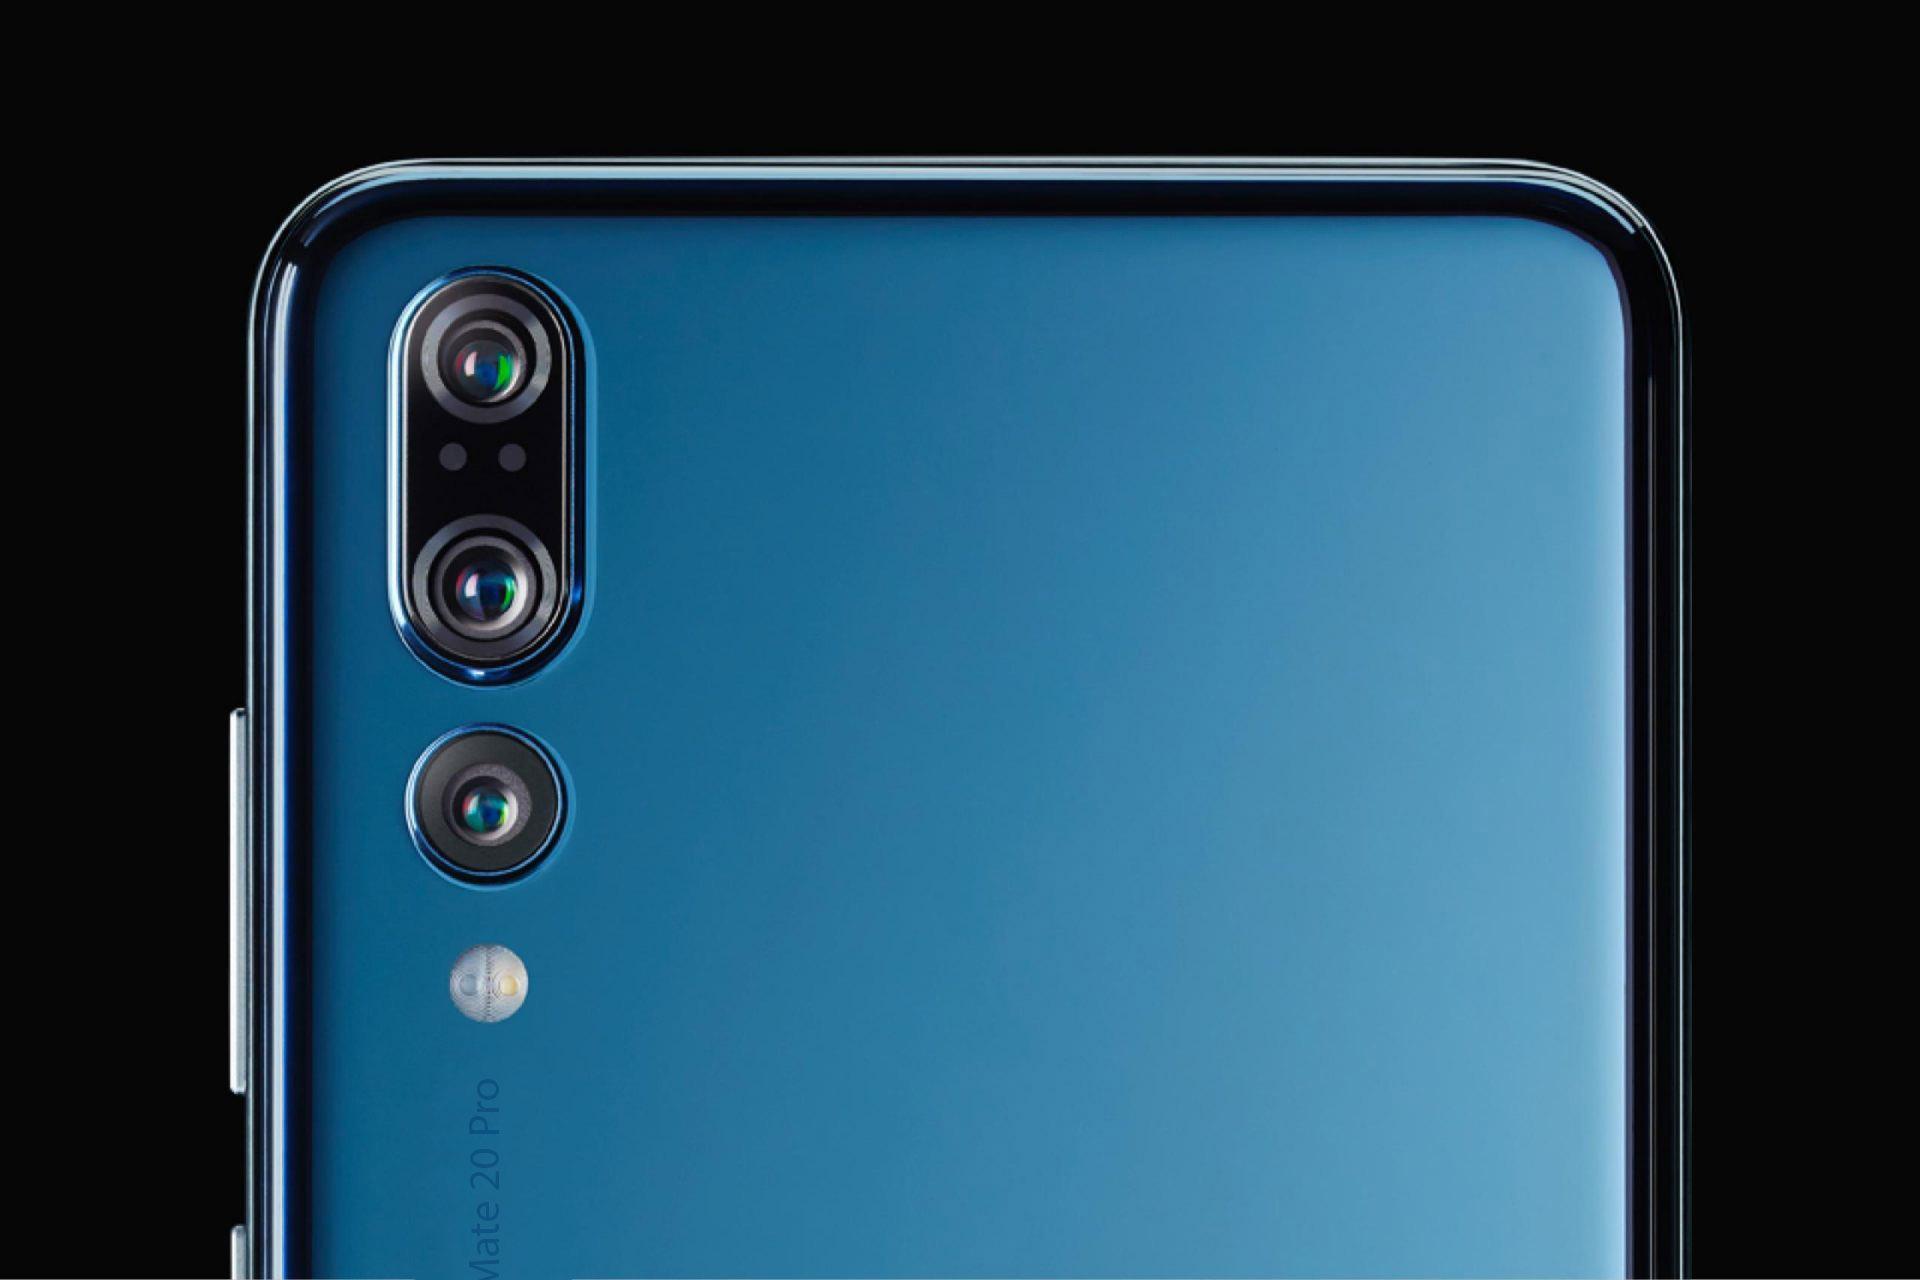 هذا هو كل ما نعرفه عن هاتف Huawei الرائد القادم Huawei Mate 20